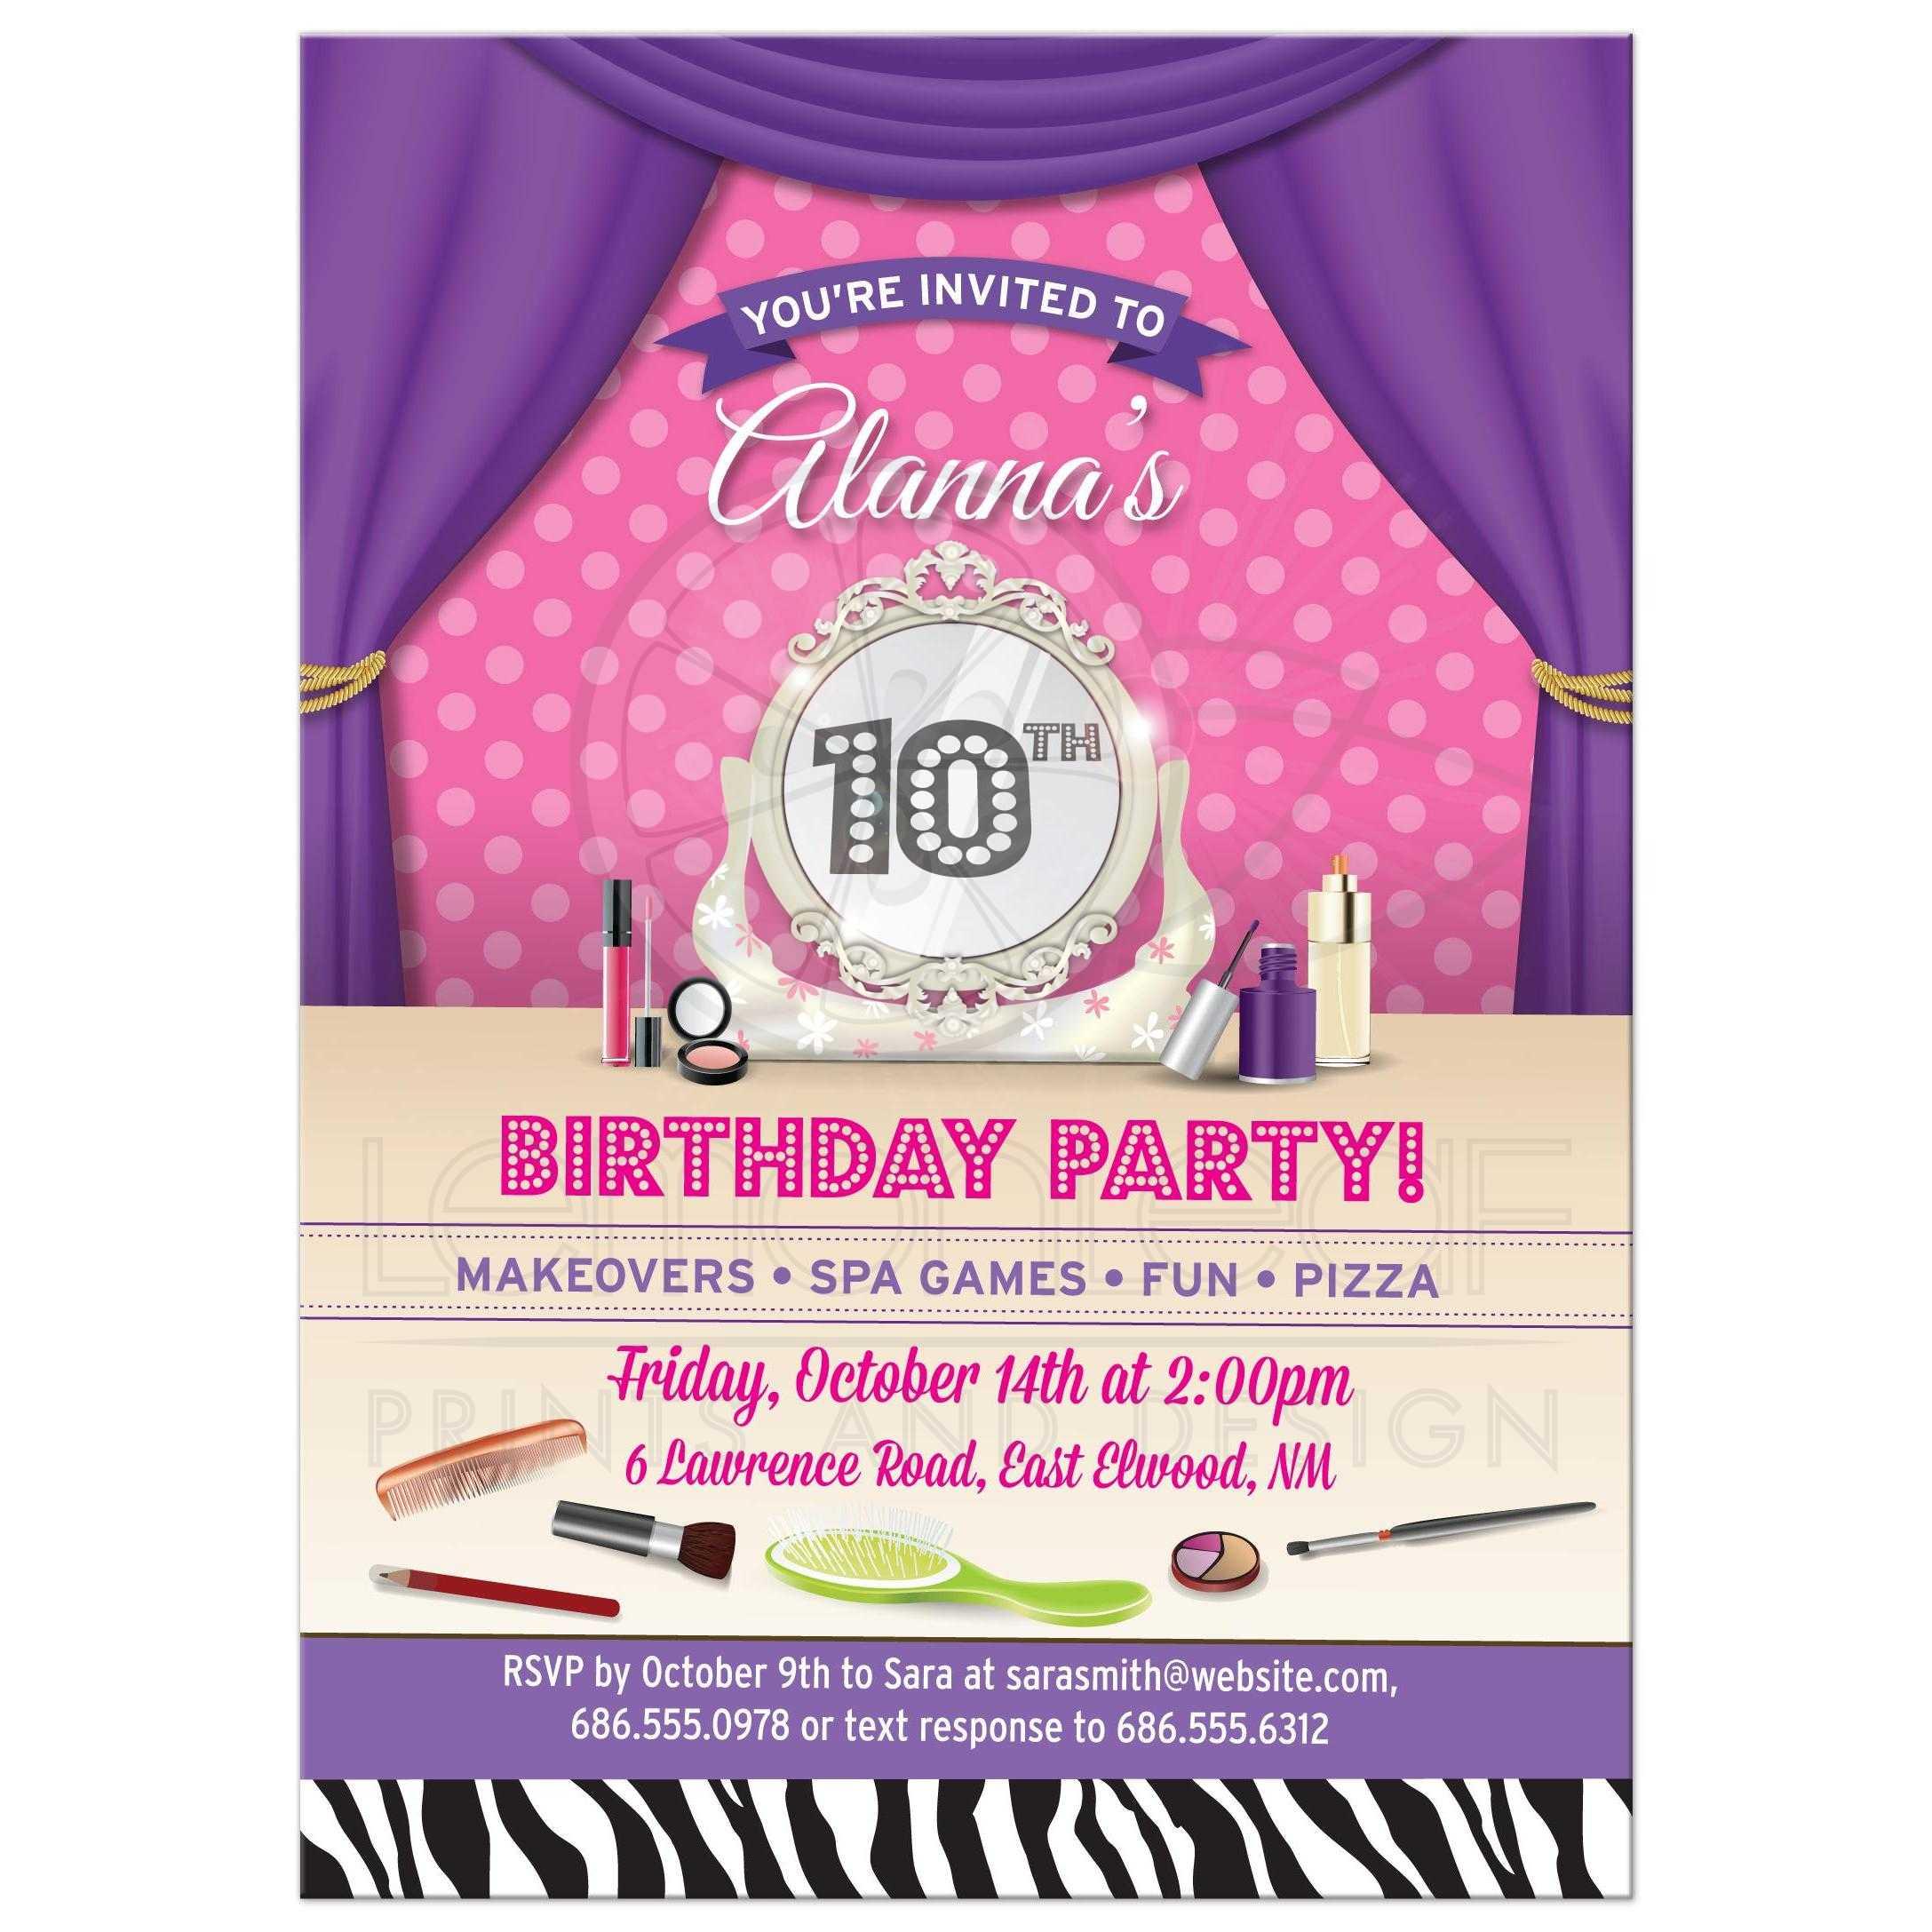 Birthday Party Invitation Makeover Spa Tween